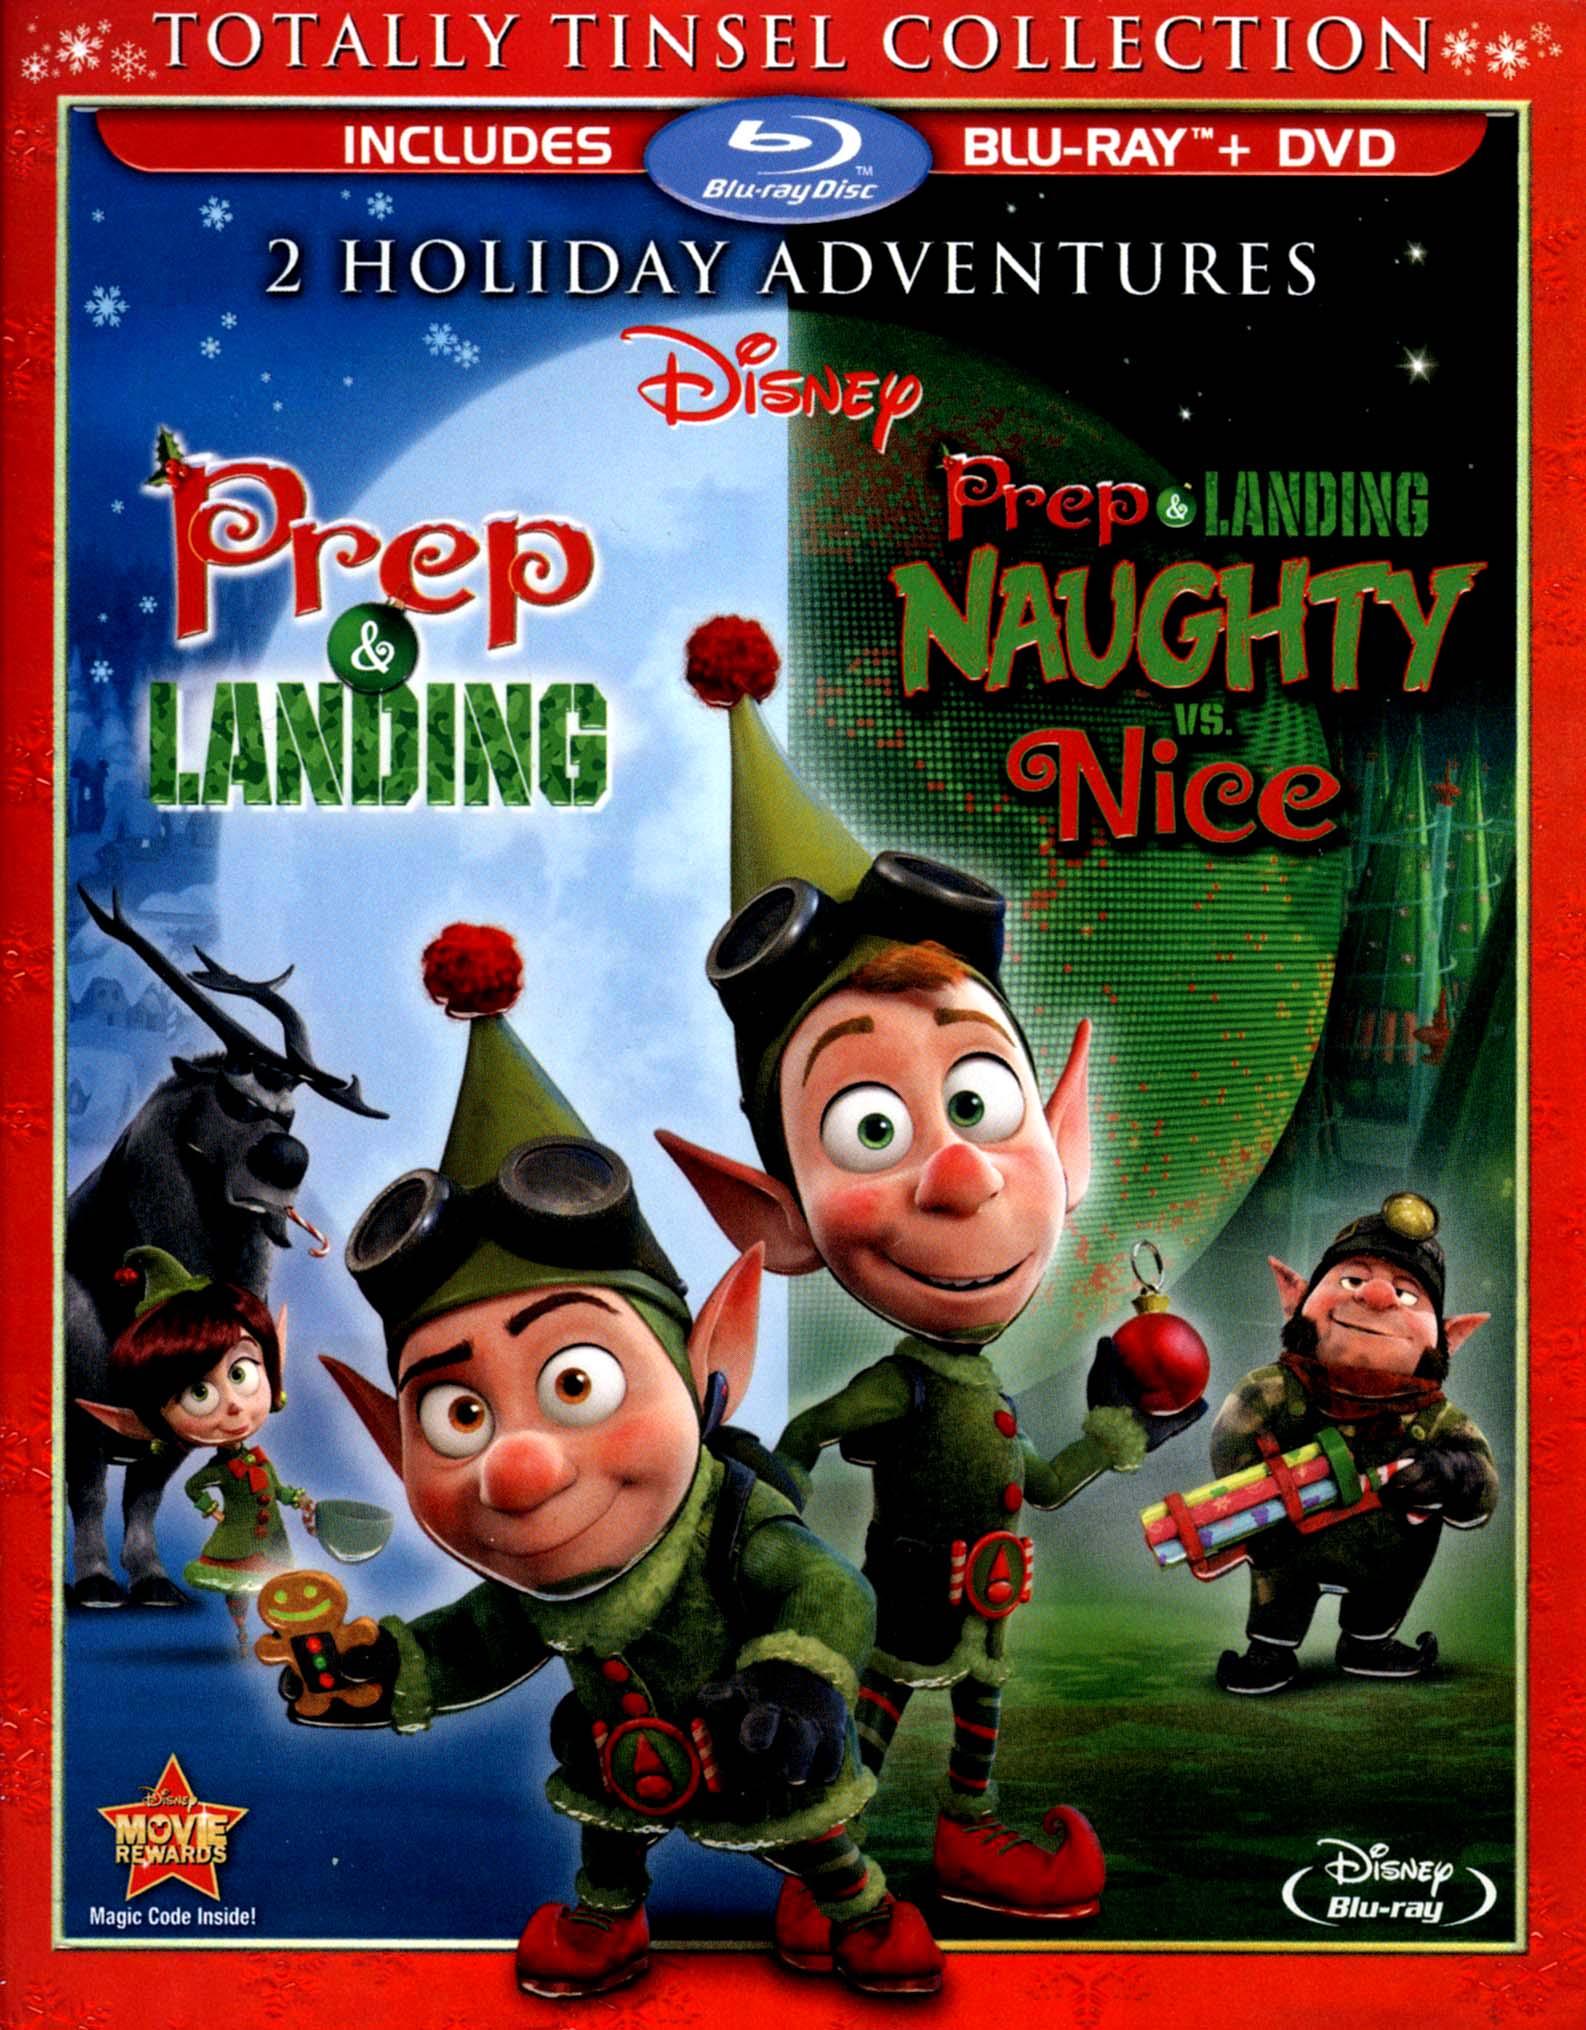 Prep & Landing/prep & Landing: Naughty Vs. Nice [2 Discs] [blu-ray/dvd] 6410077